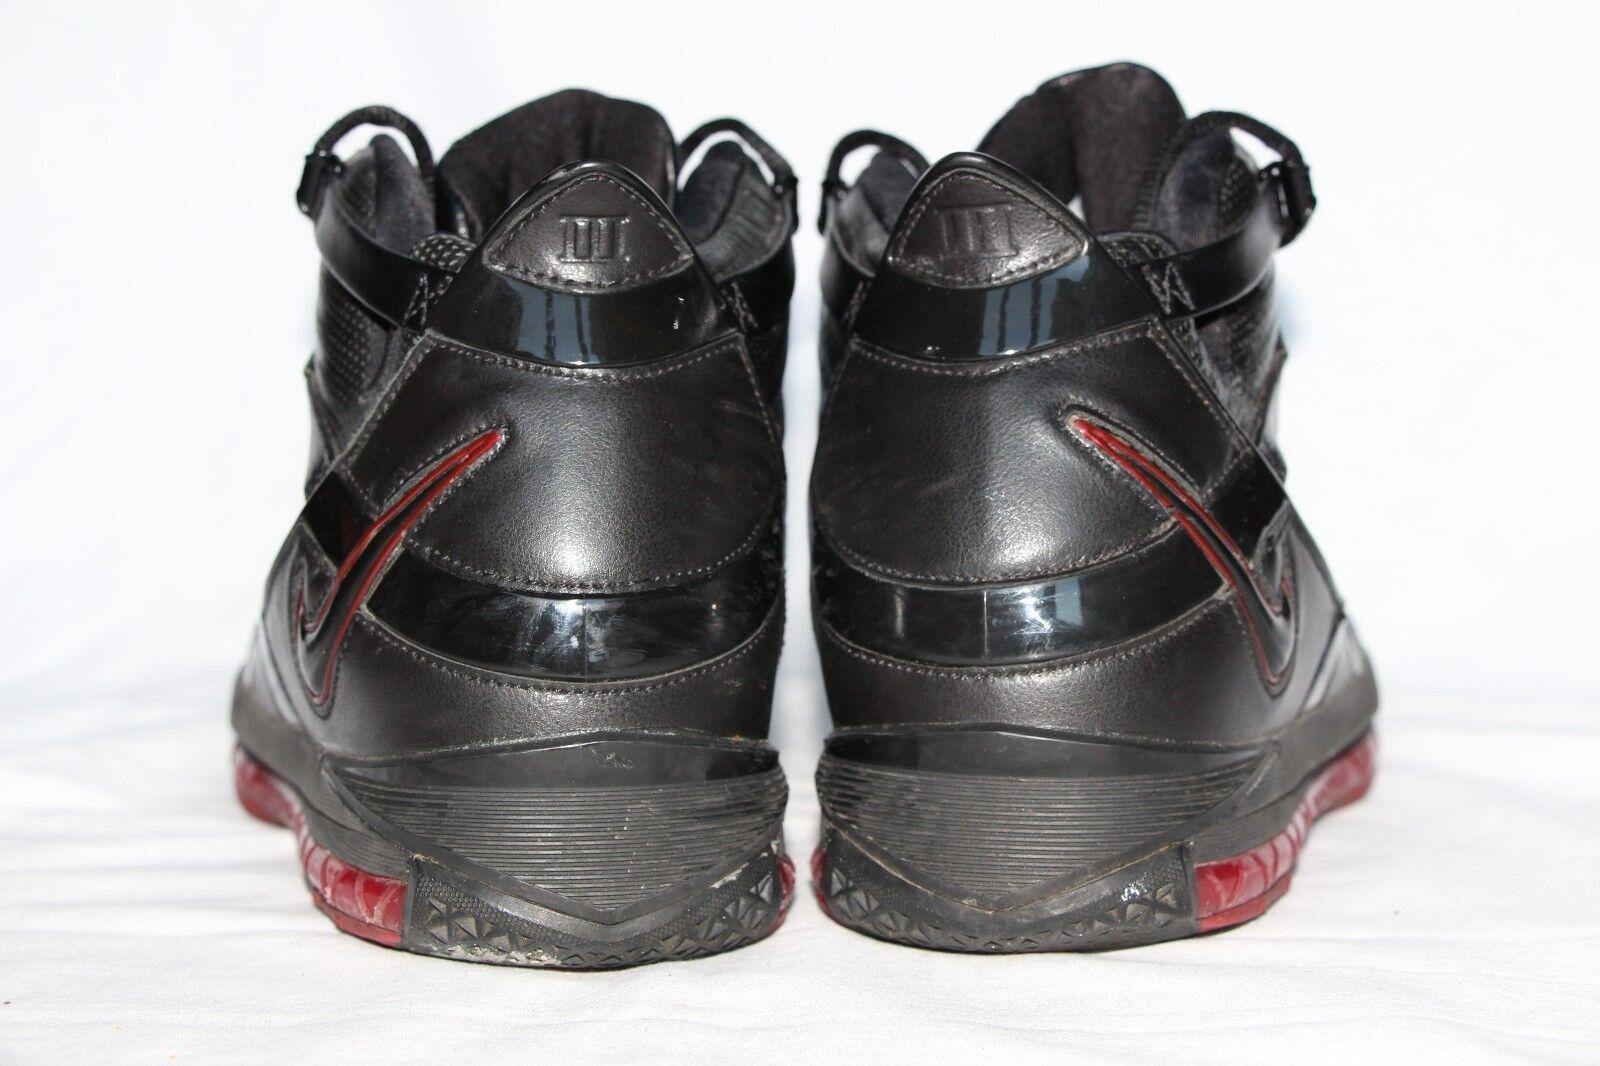 Nike Nike Nike air zoom lebron iii schwarzes leder hohem basketball männer us - 11,5 7479bf